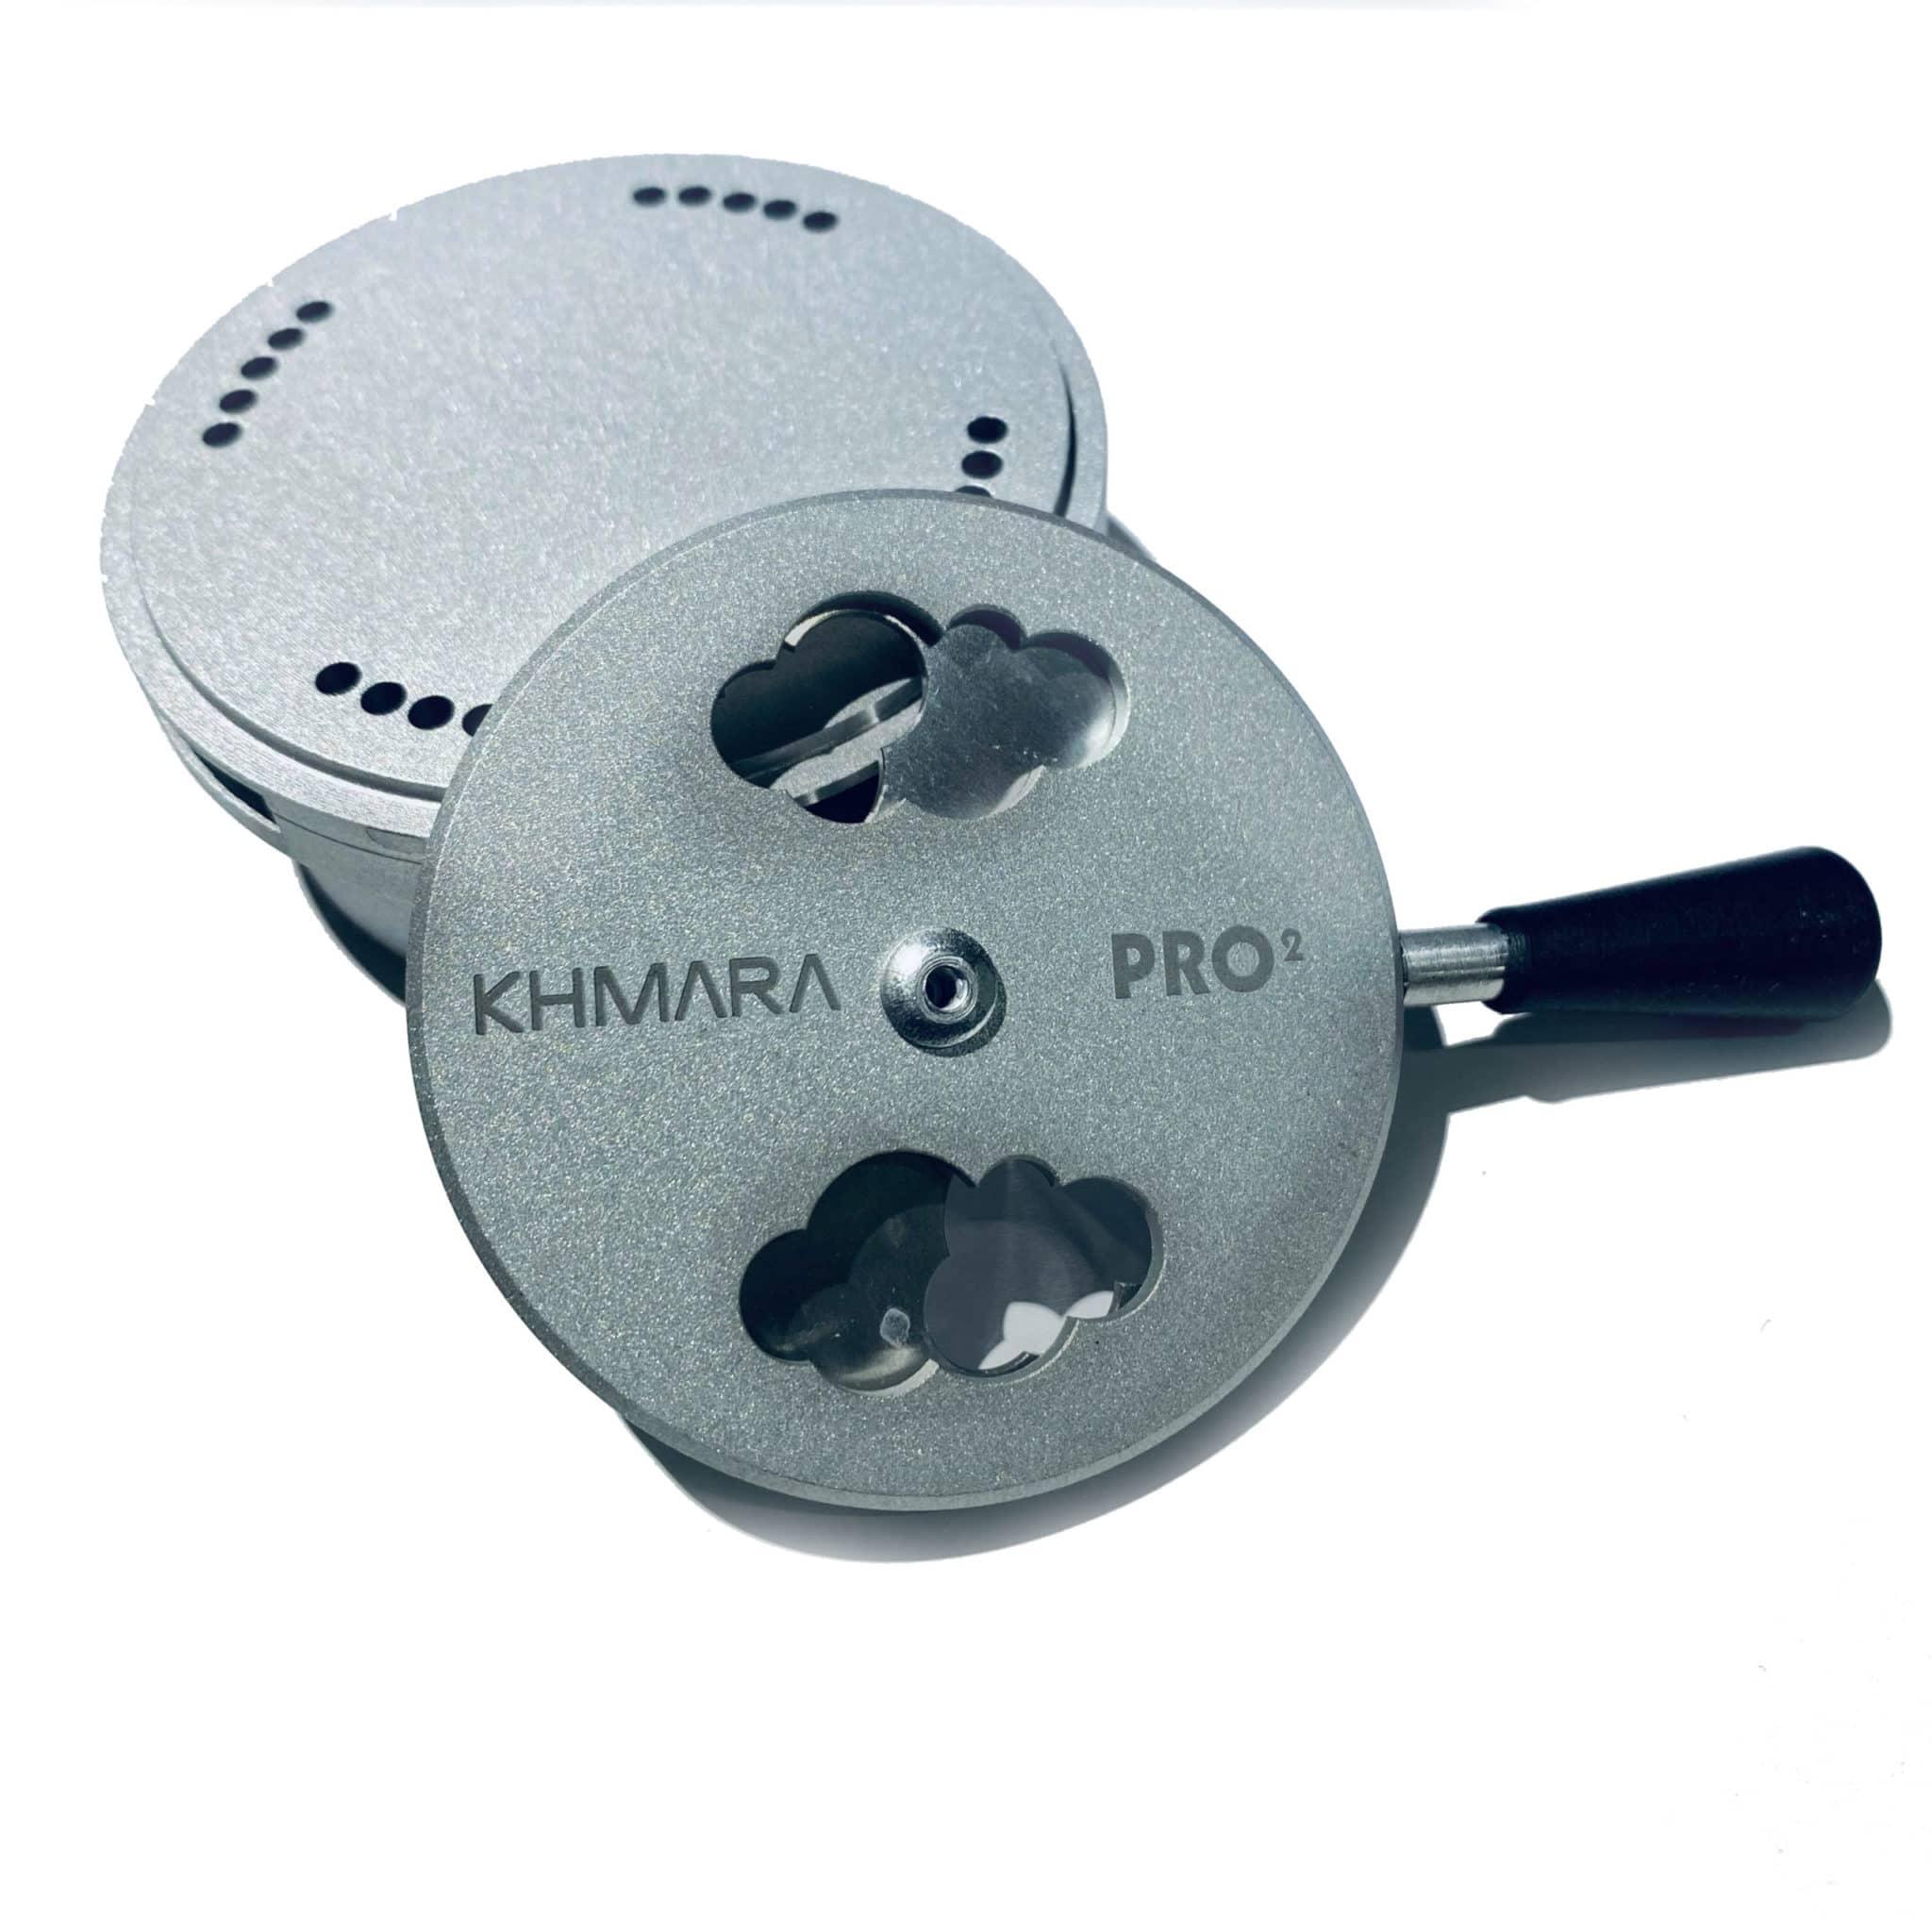 KHMARA PRO 2